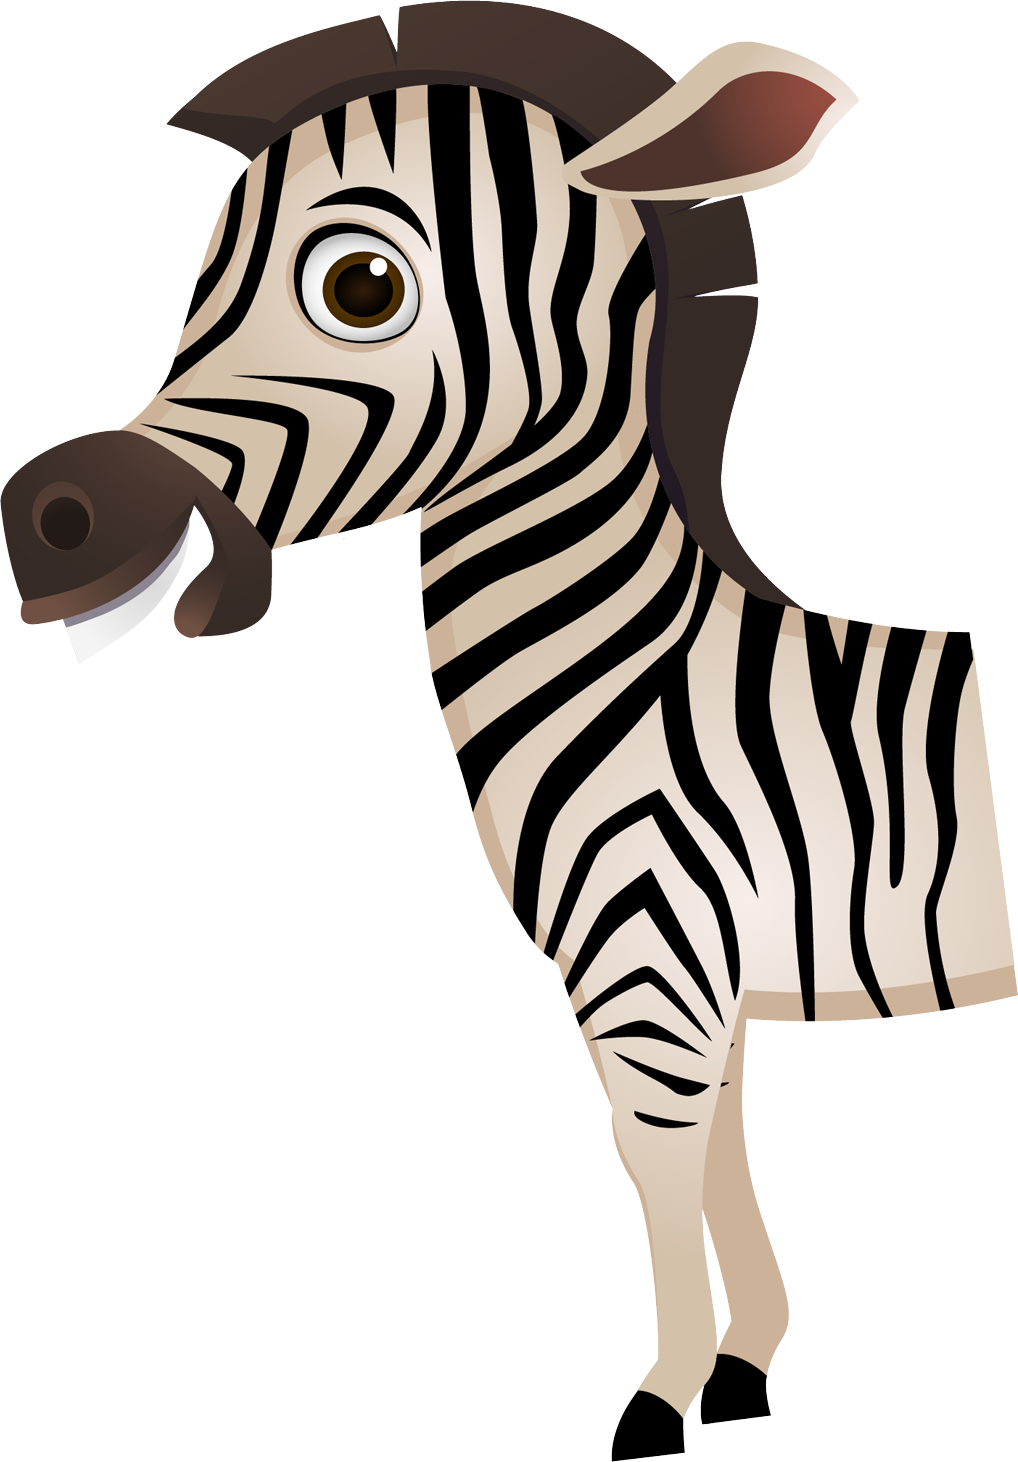 Clipart zebra cartoon character. Transprent png free download